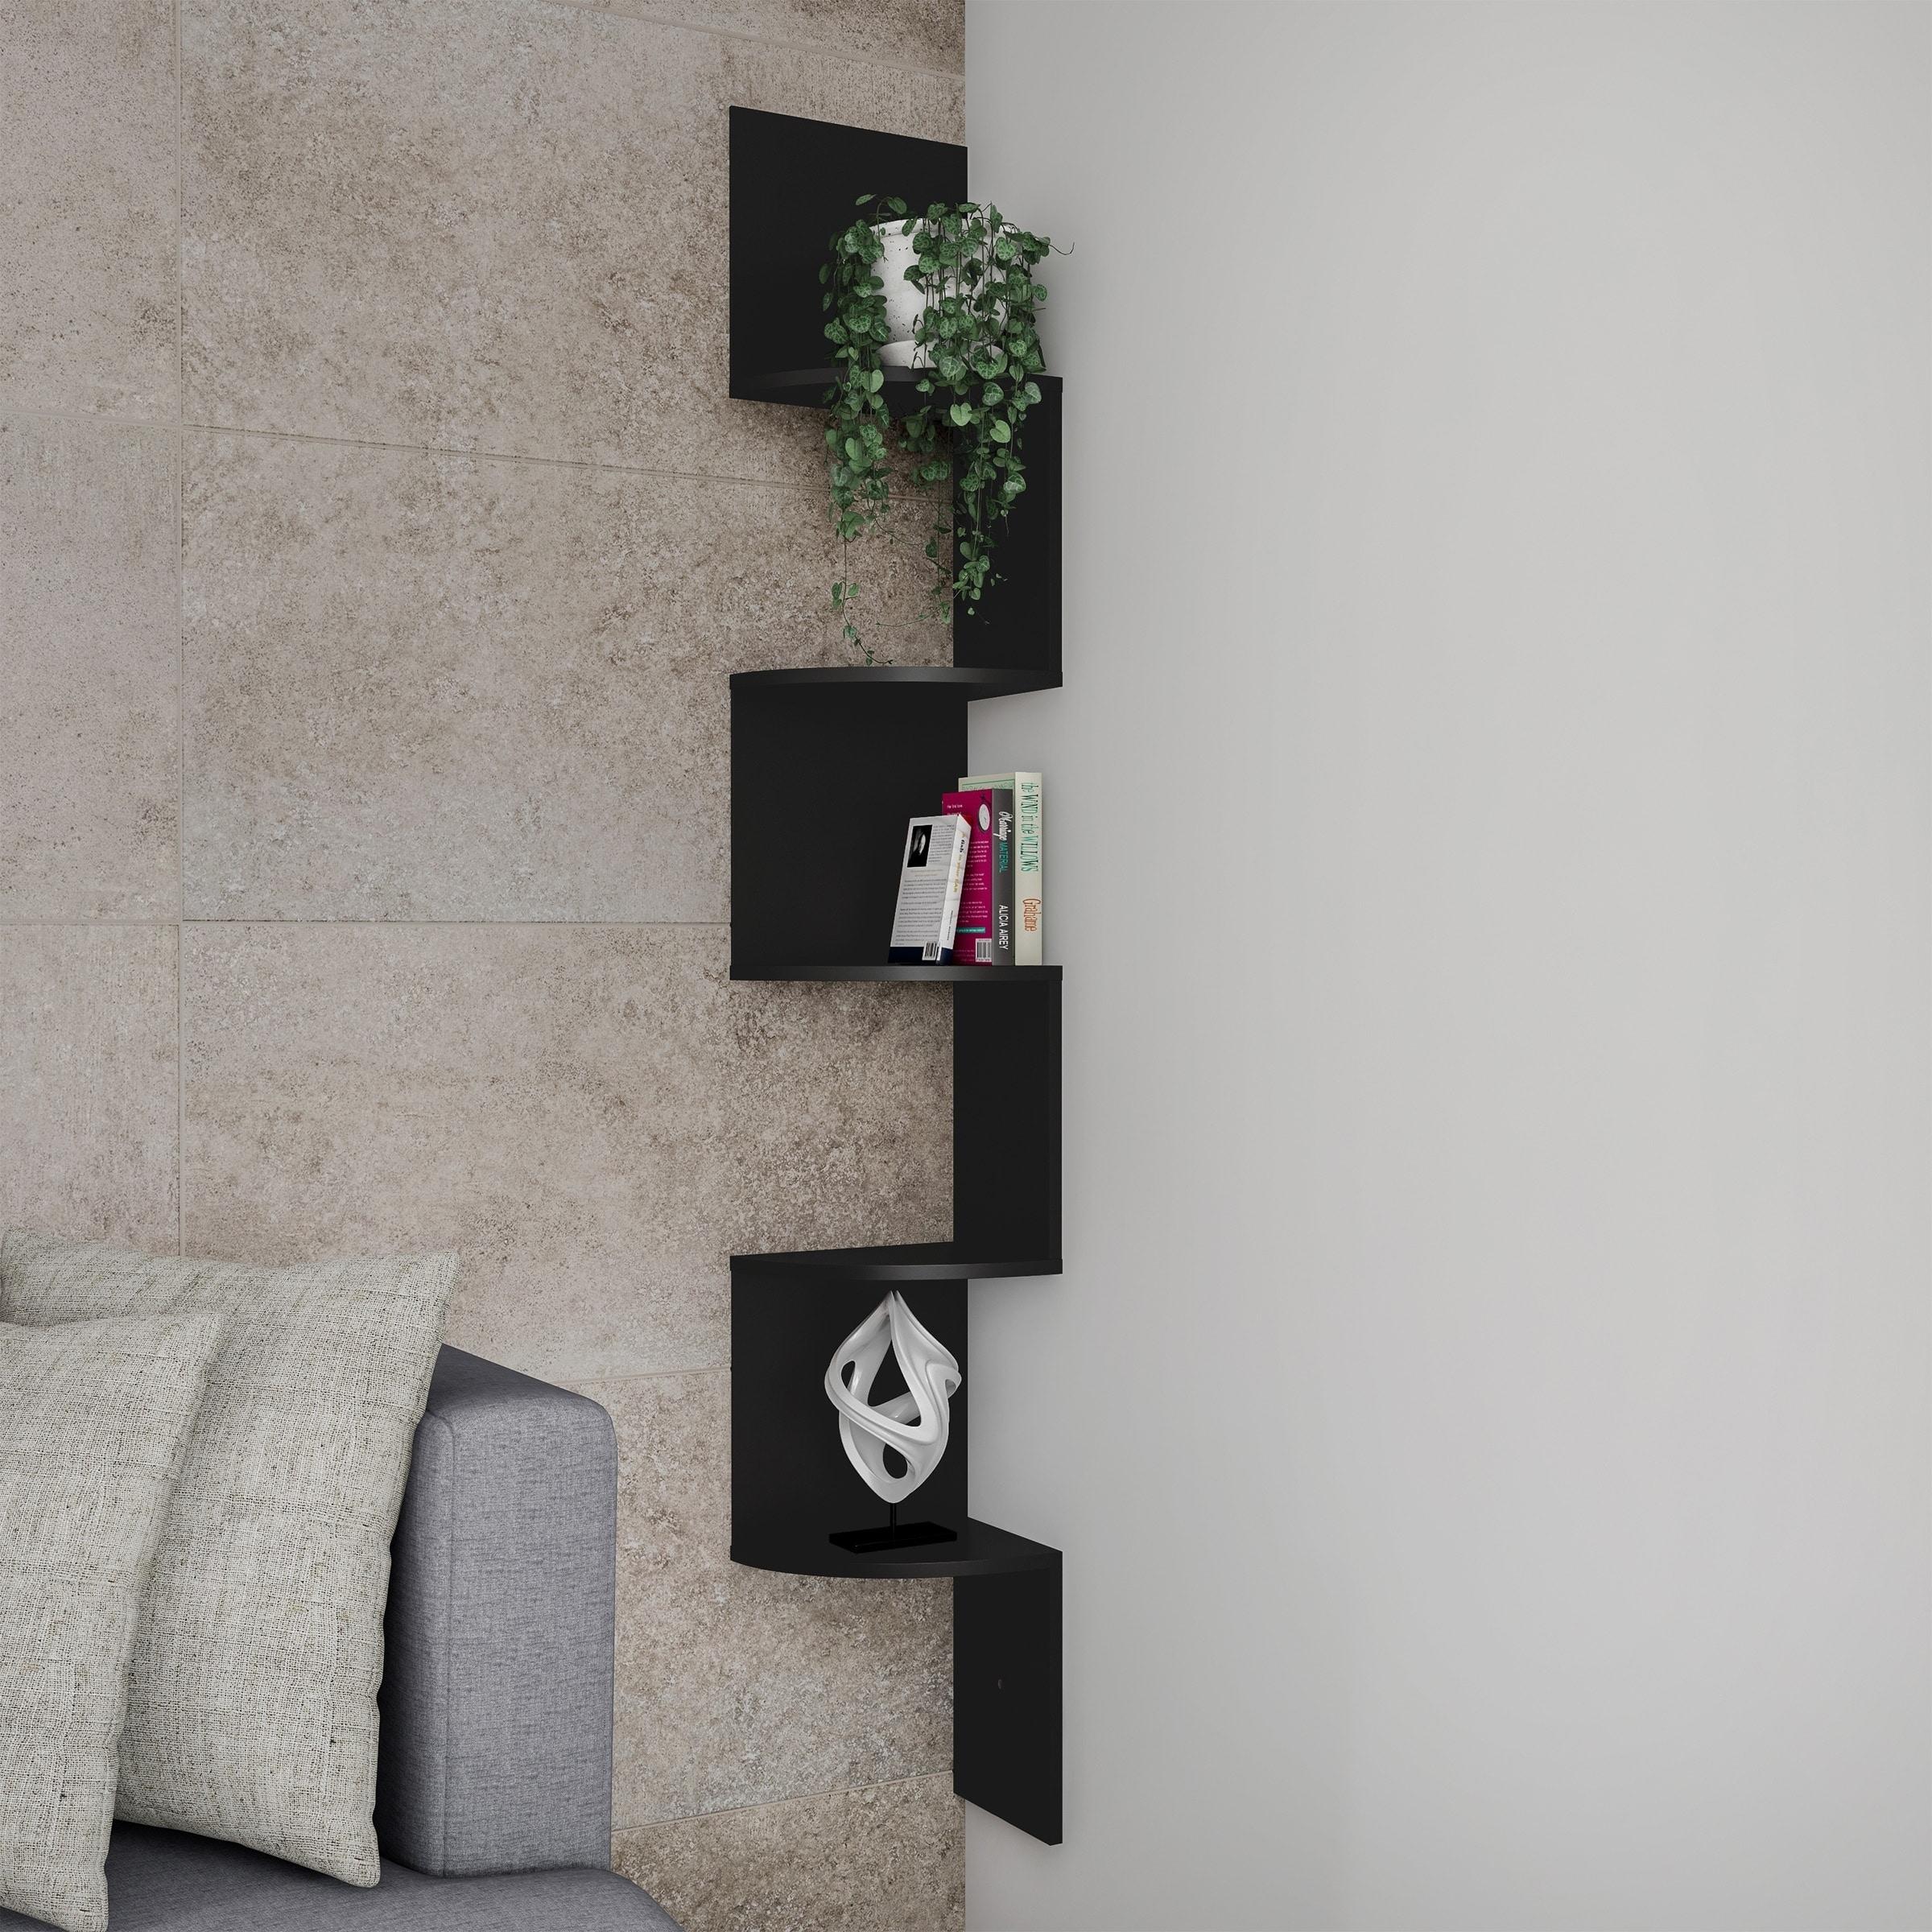 Floating Corner Shelf 5 Tier Wall Shelves With Hidden Brackets By Lavish Home